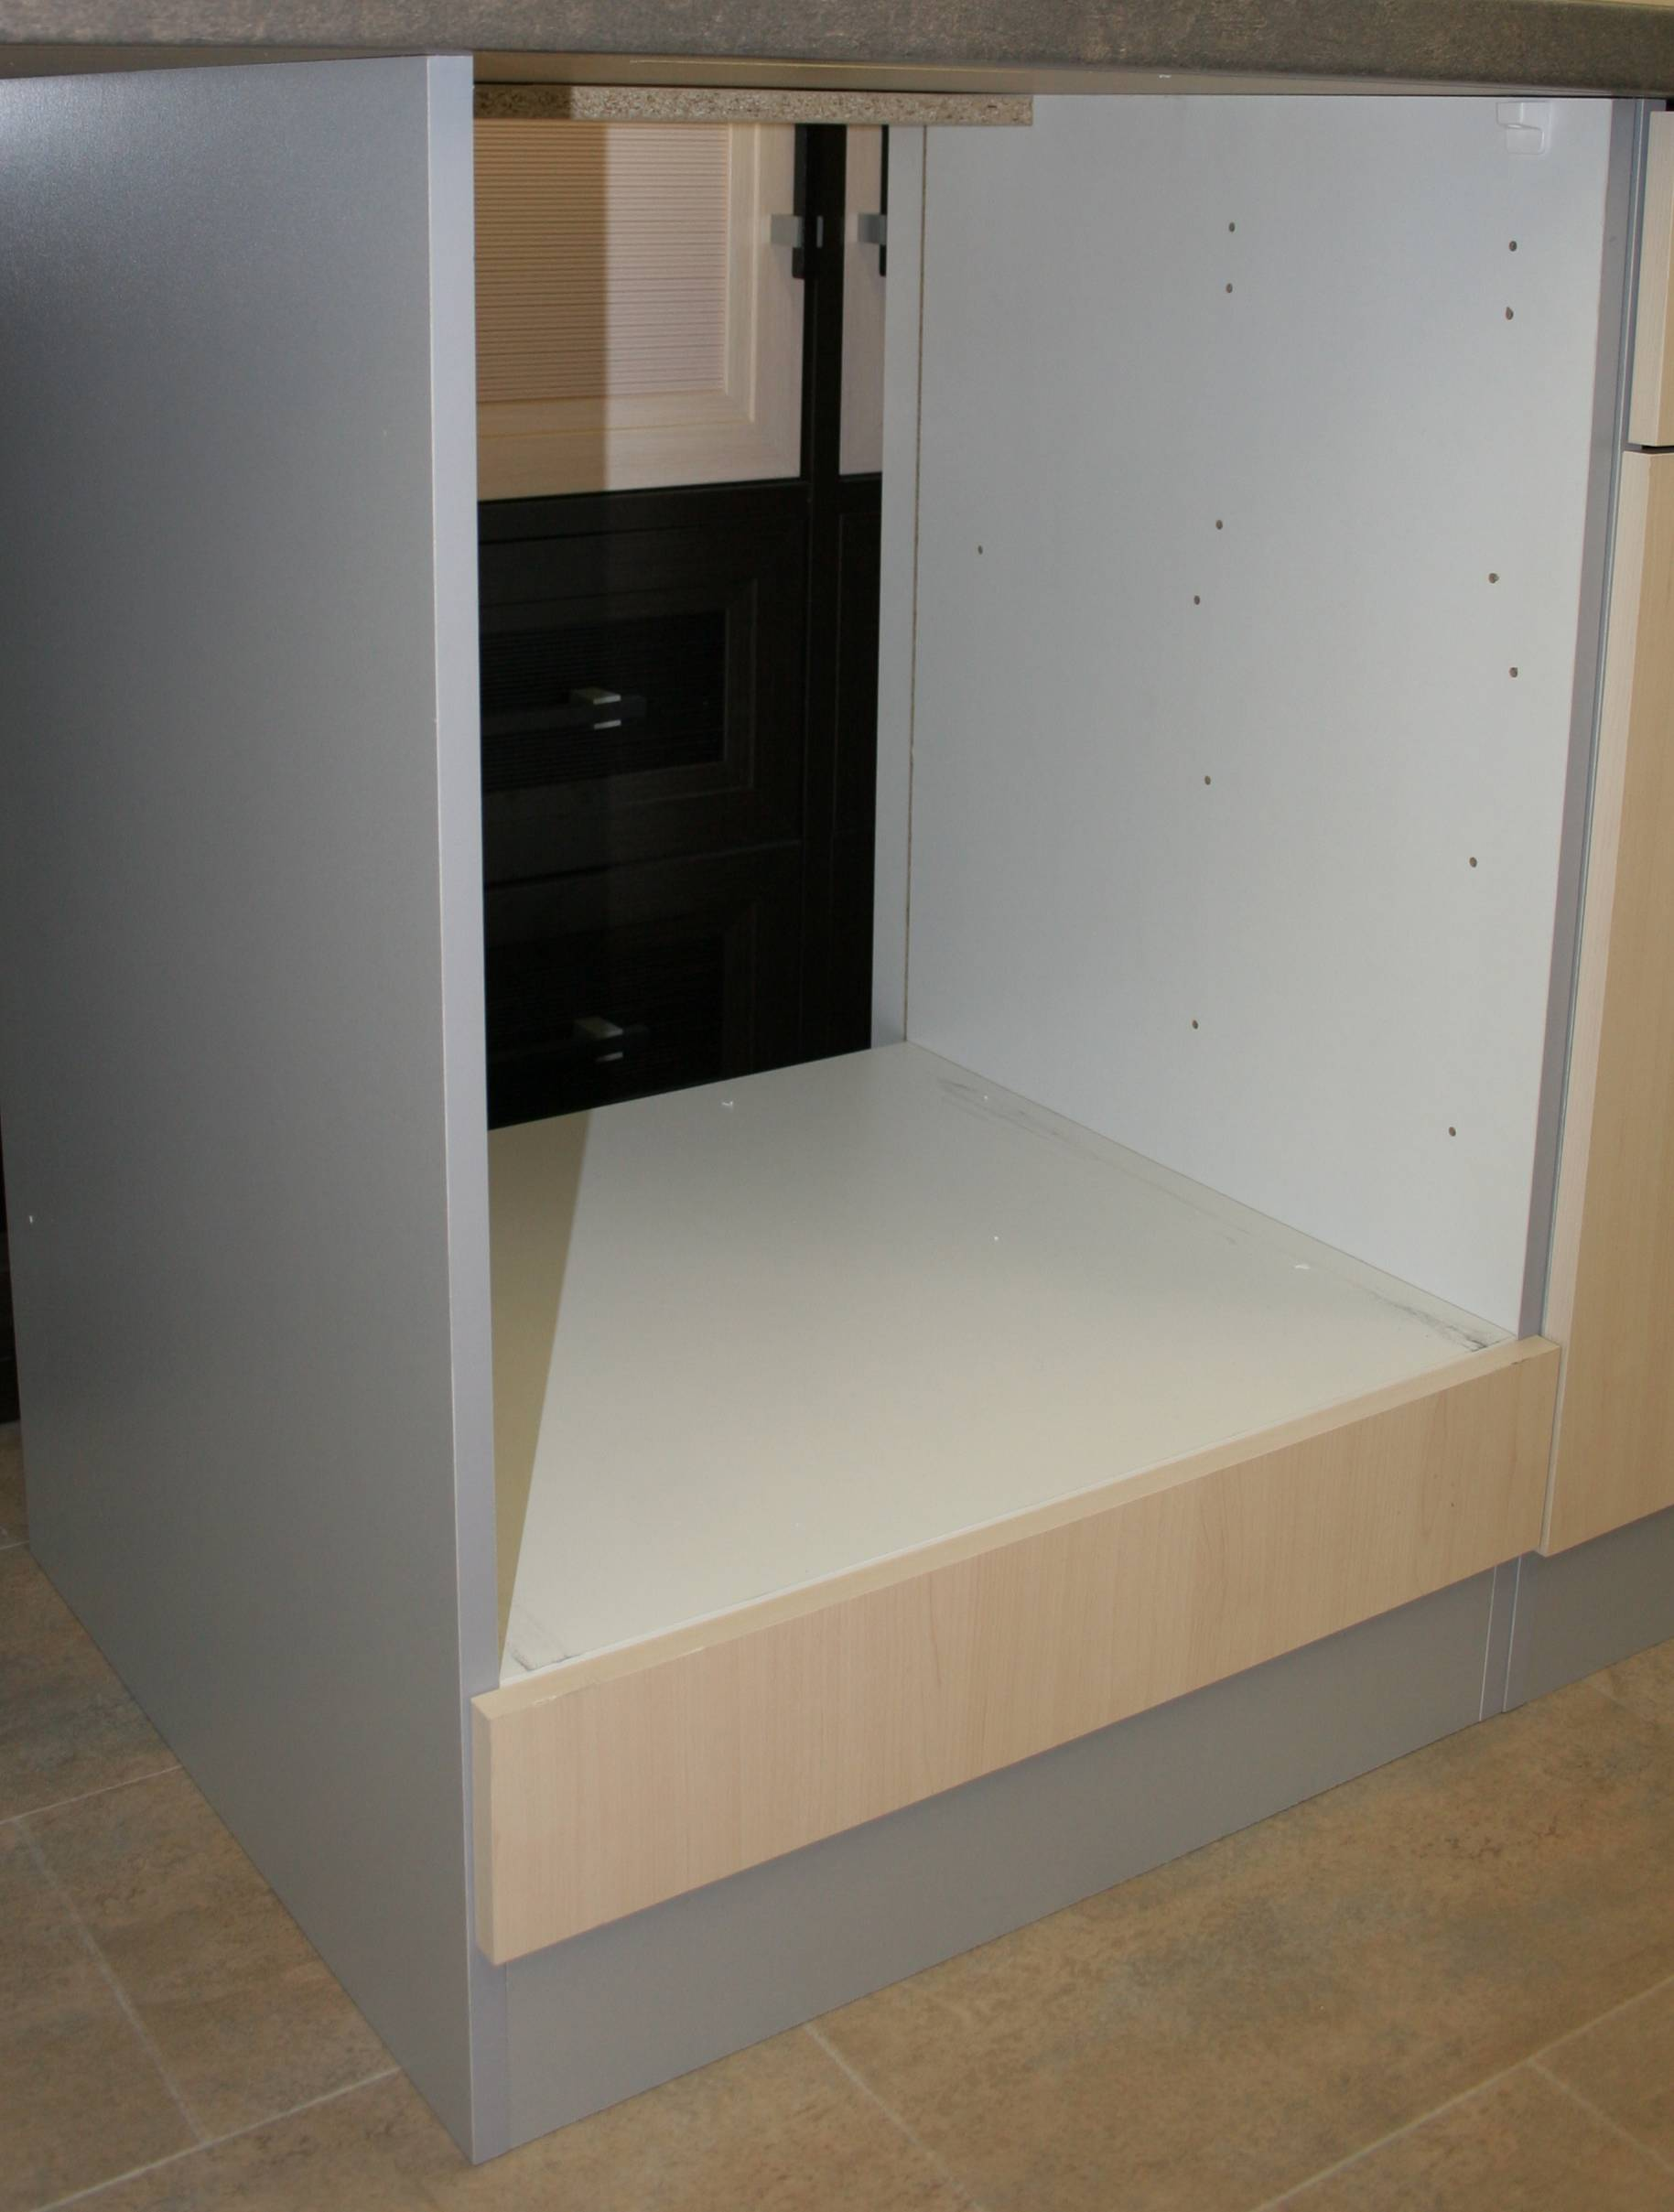 PISA Herdumbauschrank 60 cm breit 82 cm hoch birke alu